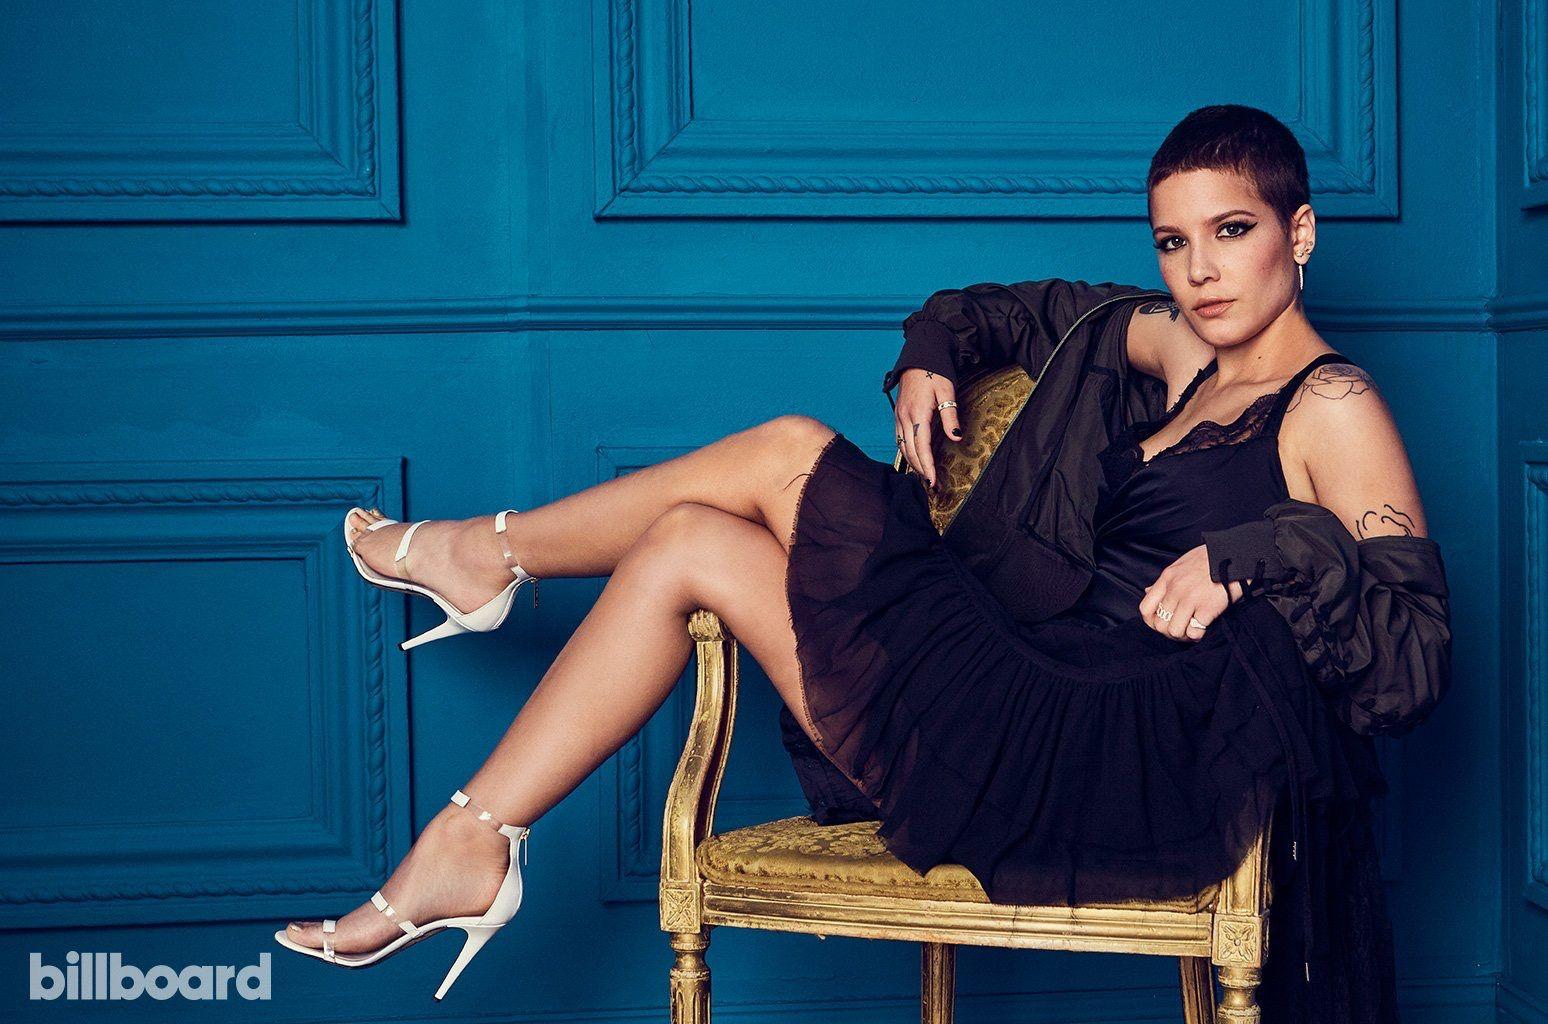 High Quality Halsey Hqhaisey: Billboard Magazine Photoshoot